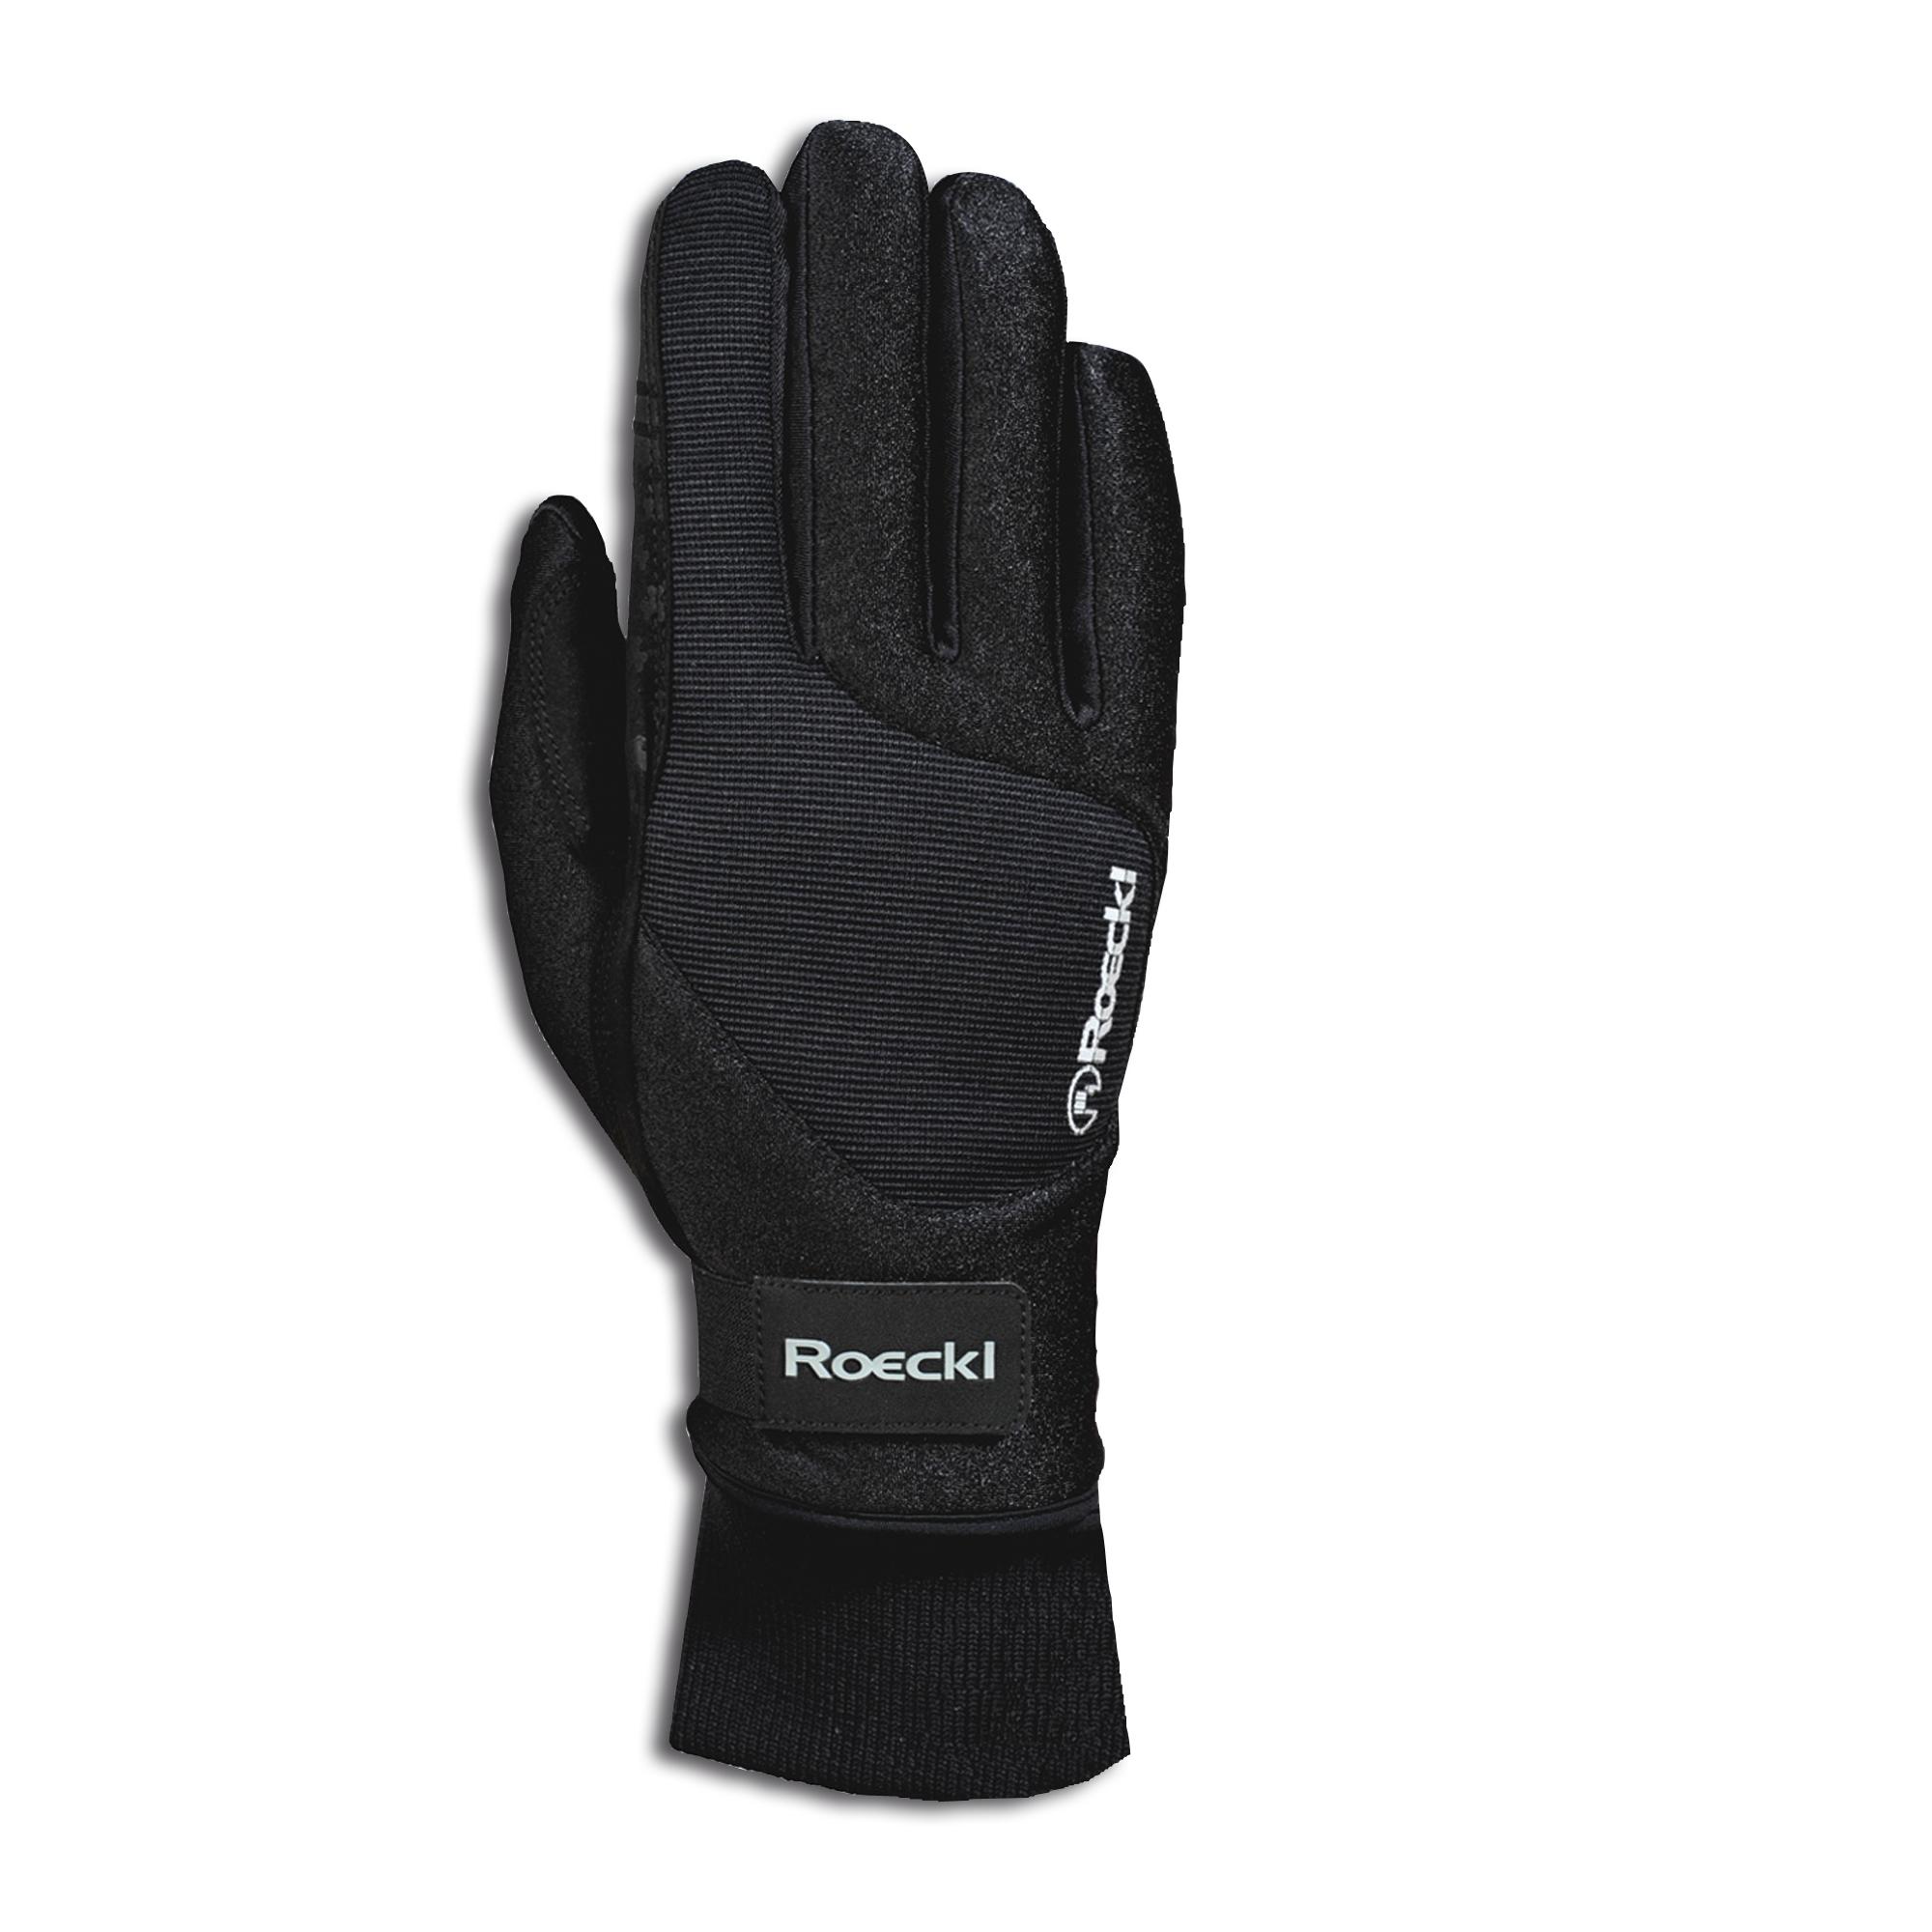 Handschuhe Roeckl Kollo Gore-Tex schwarz